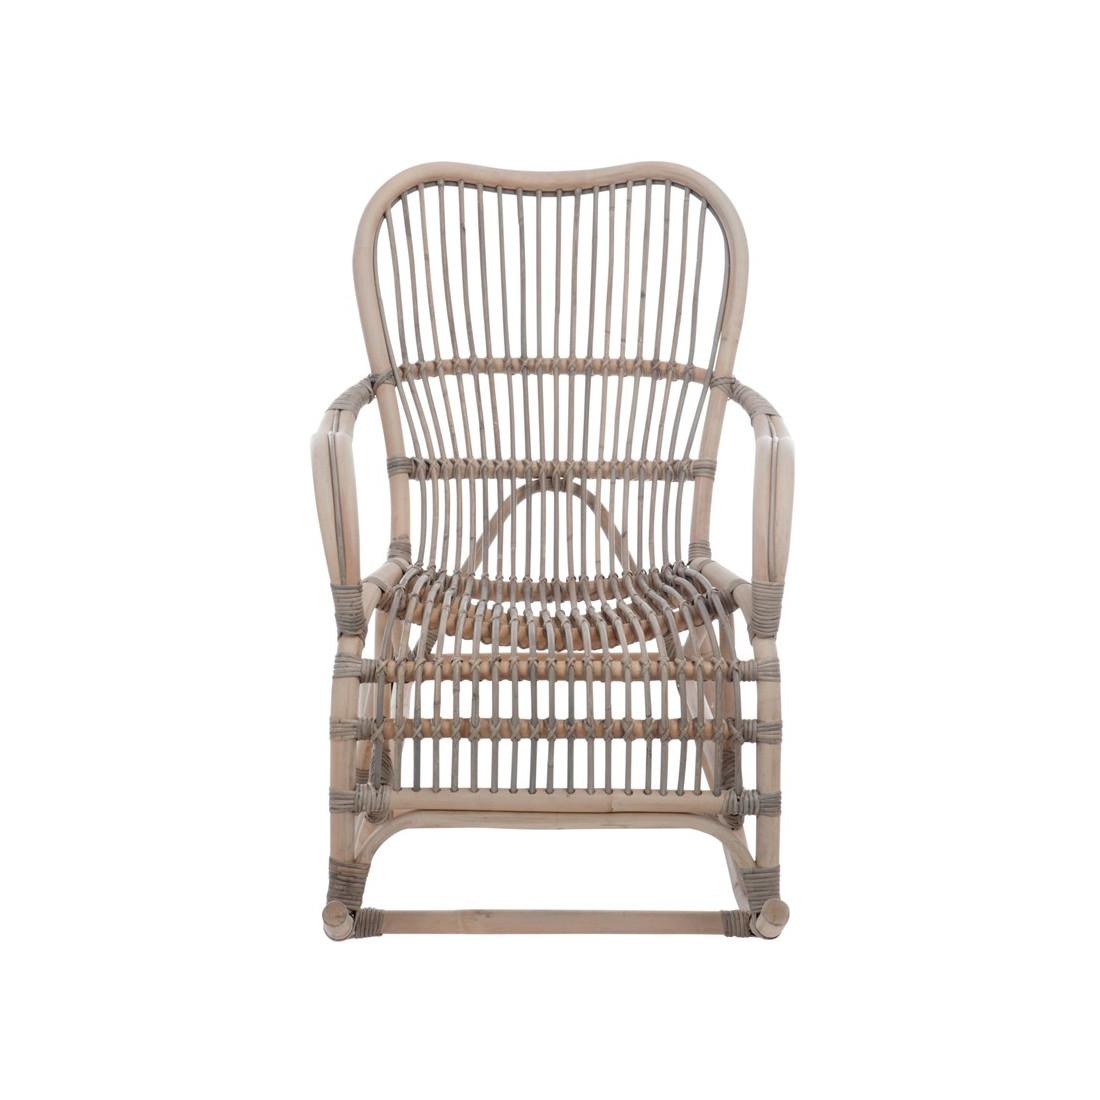 rocking chair bois rotin gris ricky univers assises et salon. Black Bedroom Furniture Sets. Home Design Ideas